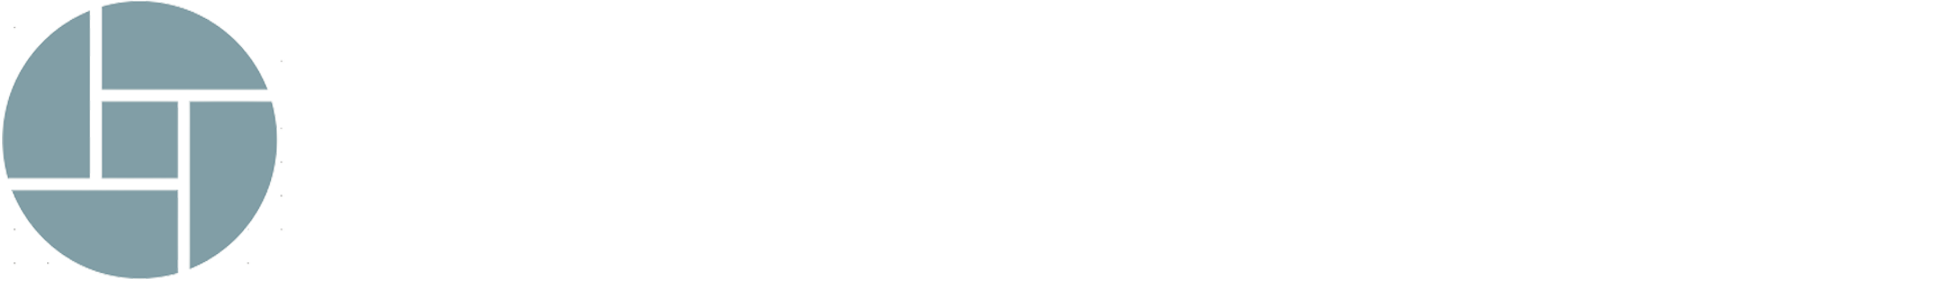 Personalistika - Top SEO